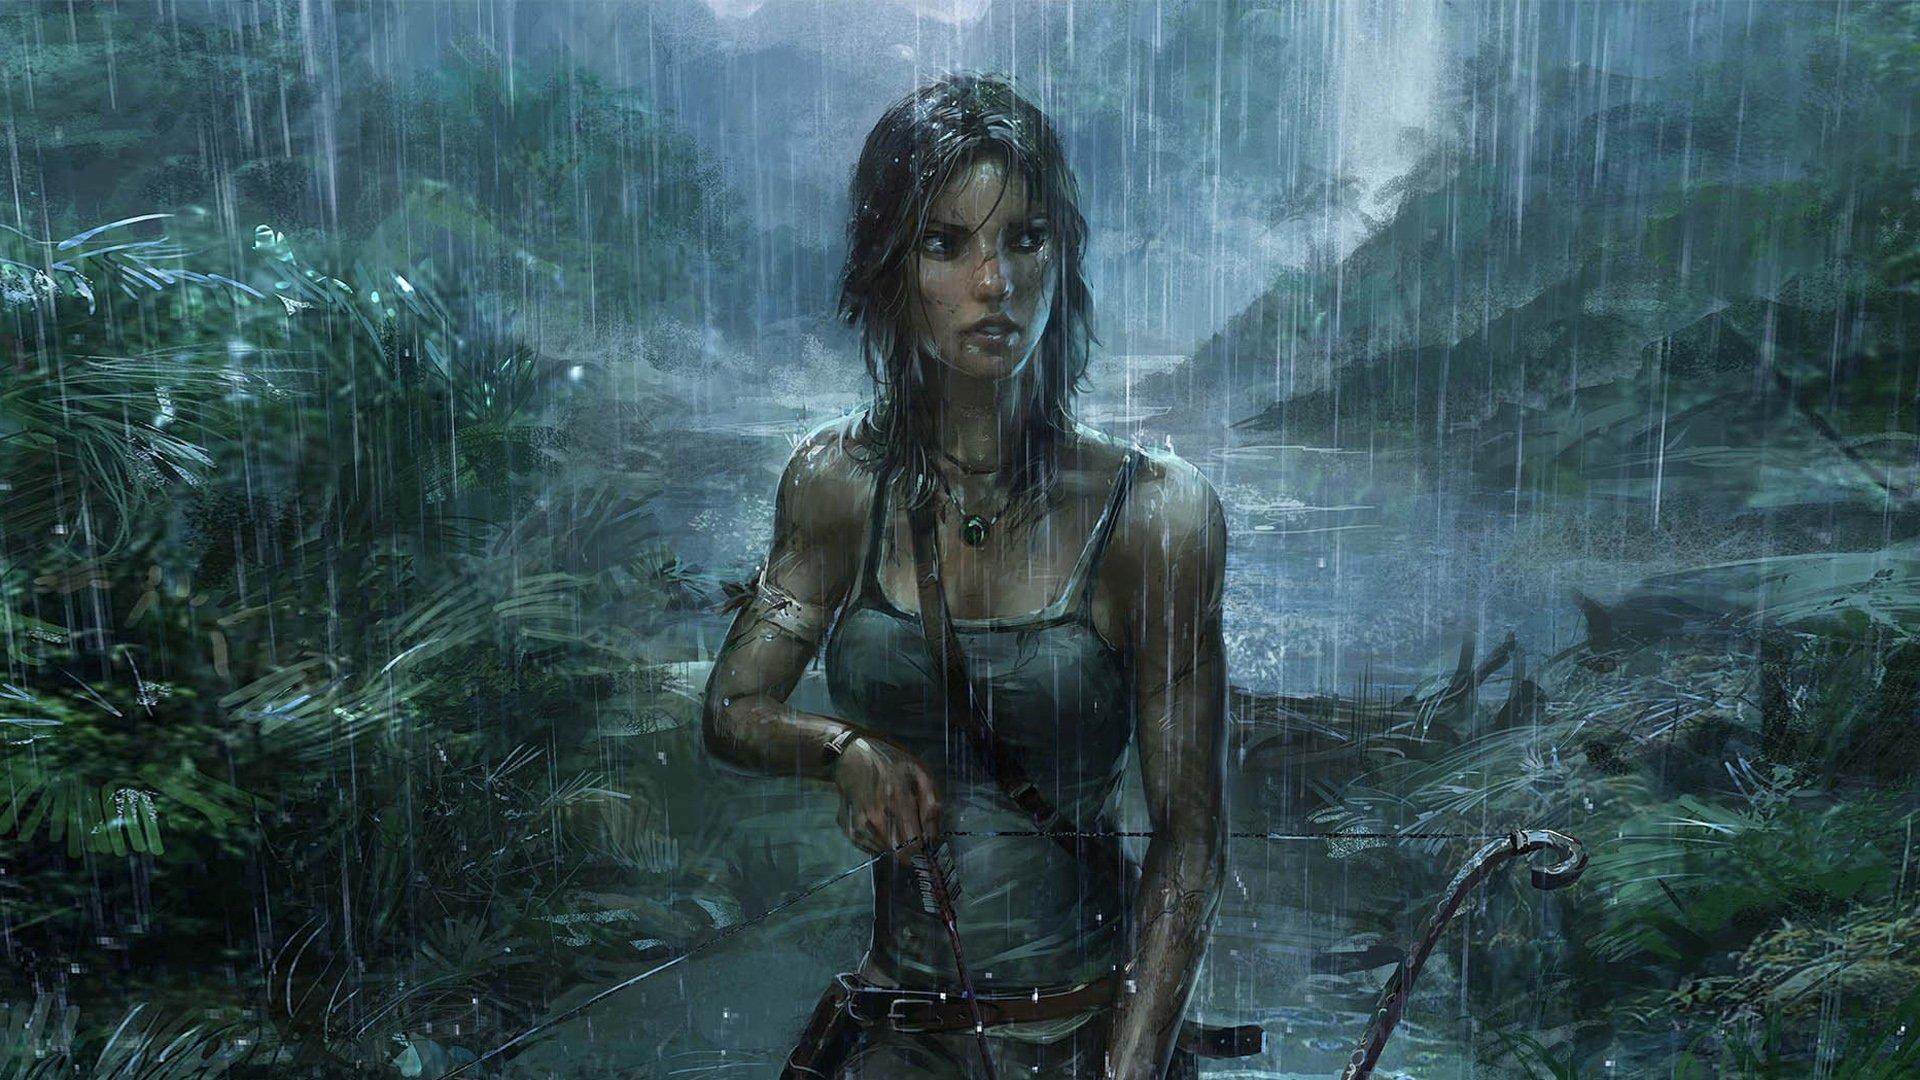 Desktop Wallpapers - Tomb Raider, Fan art - Games | Free Desktop Backgrounds 1920x1080